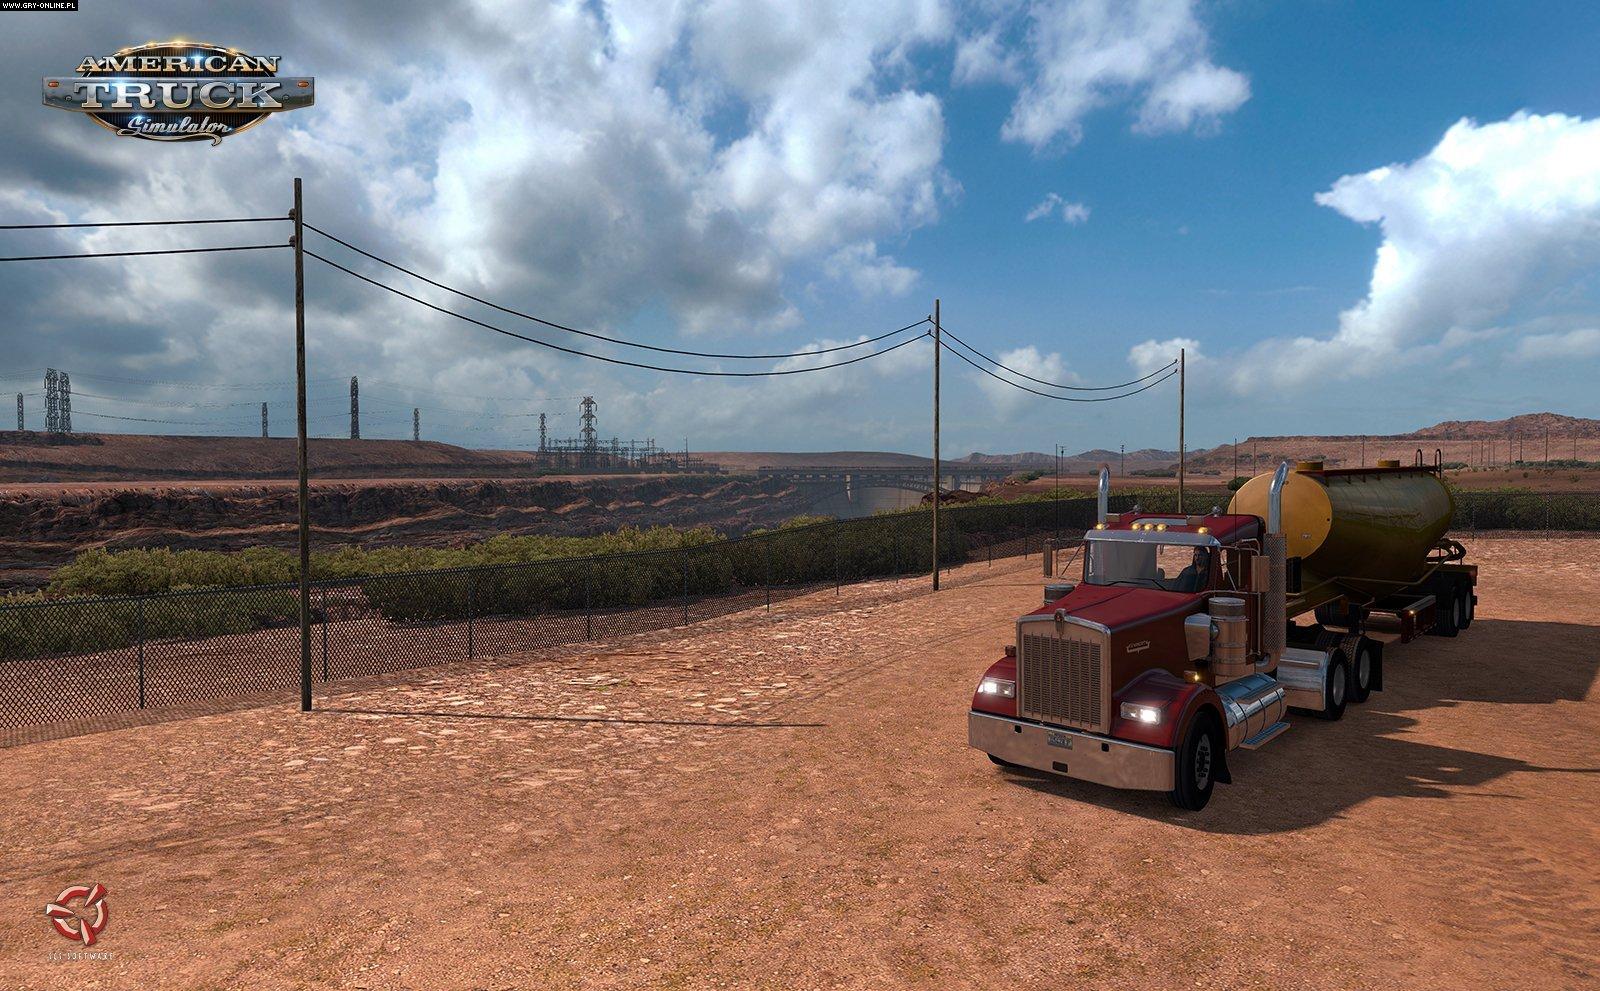 american truck simulator telecharger et torrent pc jeu crack t l charger gratuit. Black Bedroom Furniture Sets. Home Design Ideas